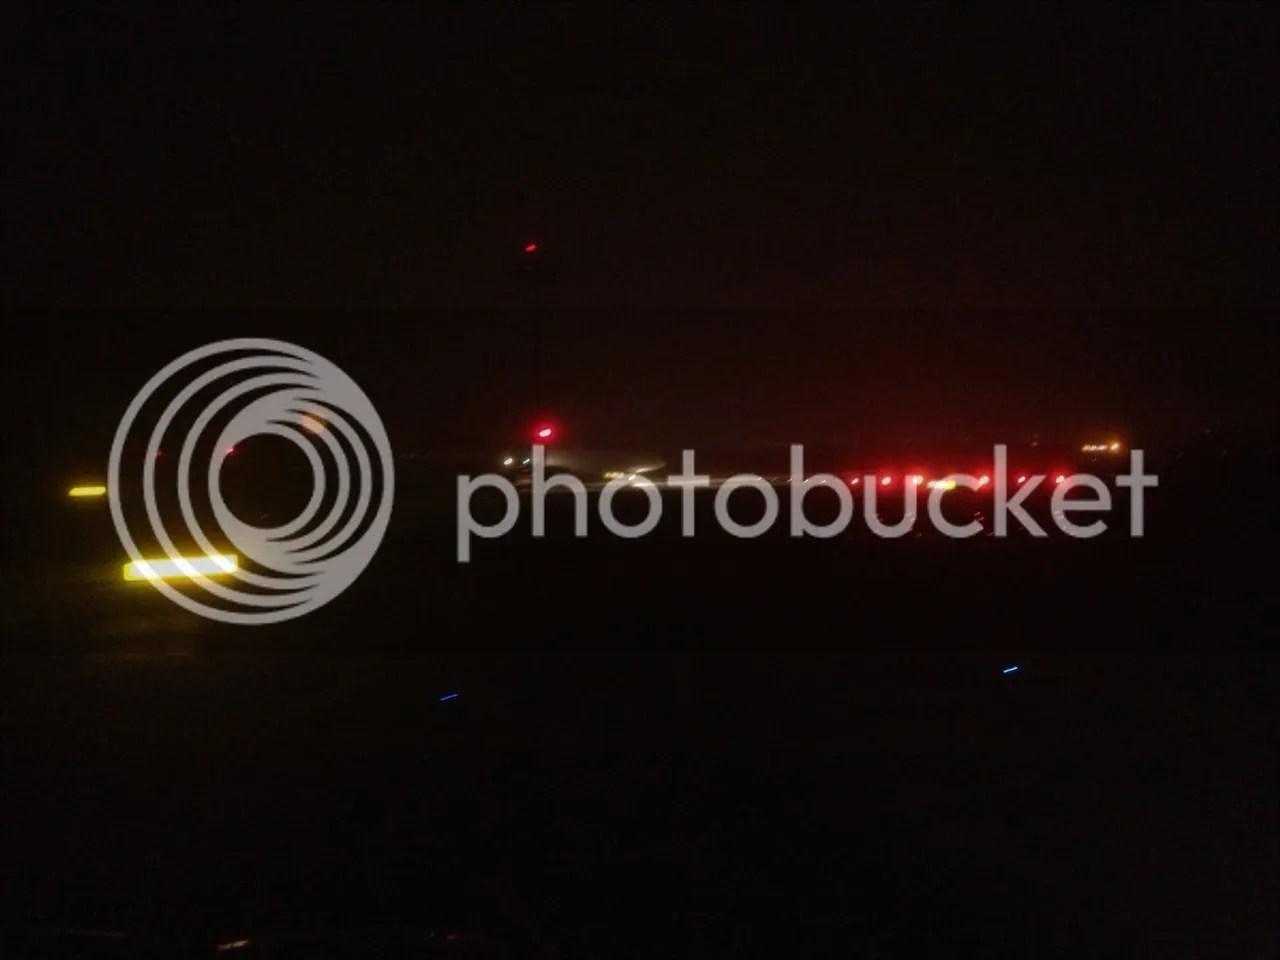 https://i2.wp.com/i181.photobucket.com/albums/x35/jwhite9185/Milan/file-115.jpg